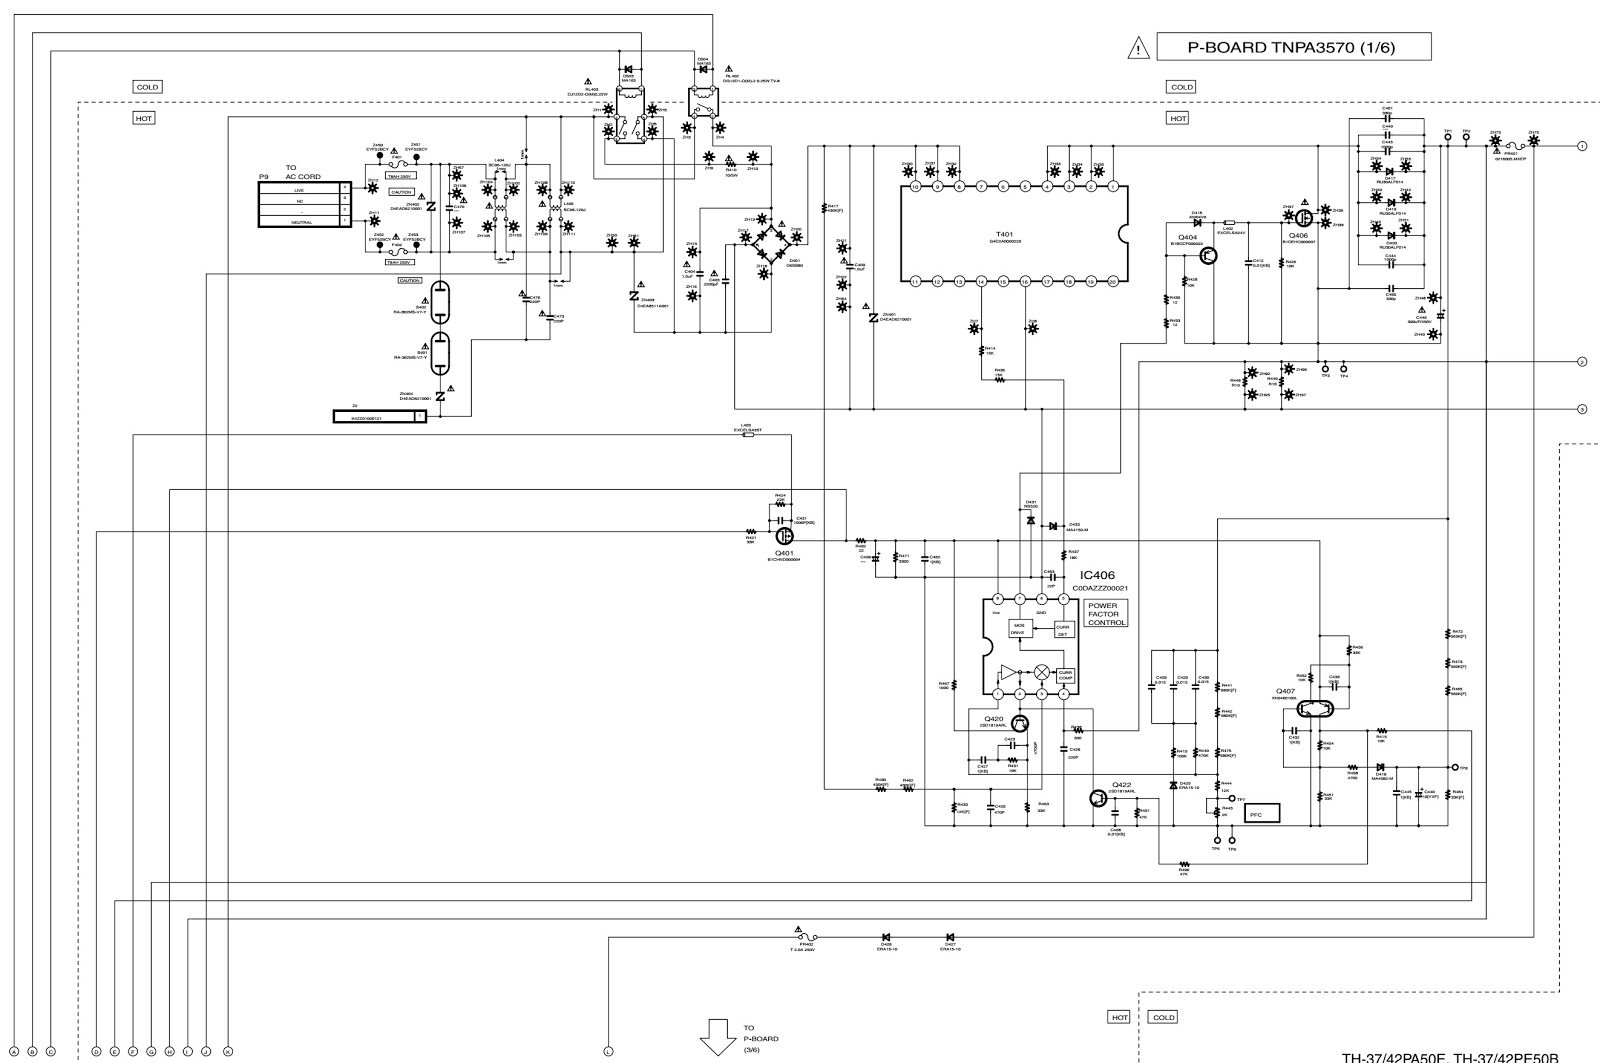 panasonic plasma tv th42 th37 power board schematic schematic panasonic plasma tv circuit diagram panasonic plasma tv diagram [ 1600 x 1063 Pixel ]